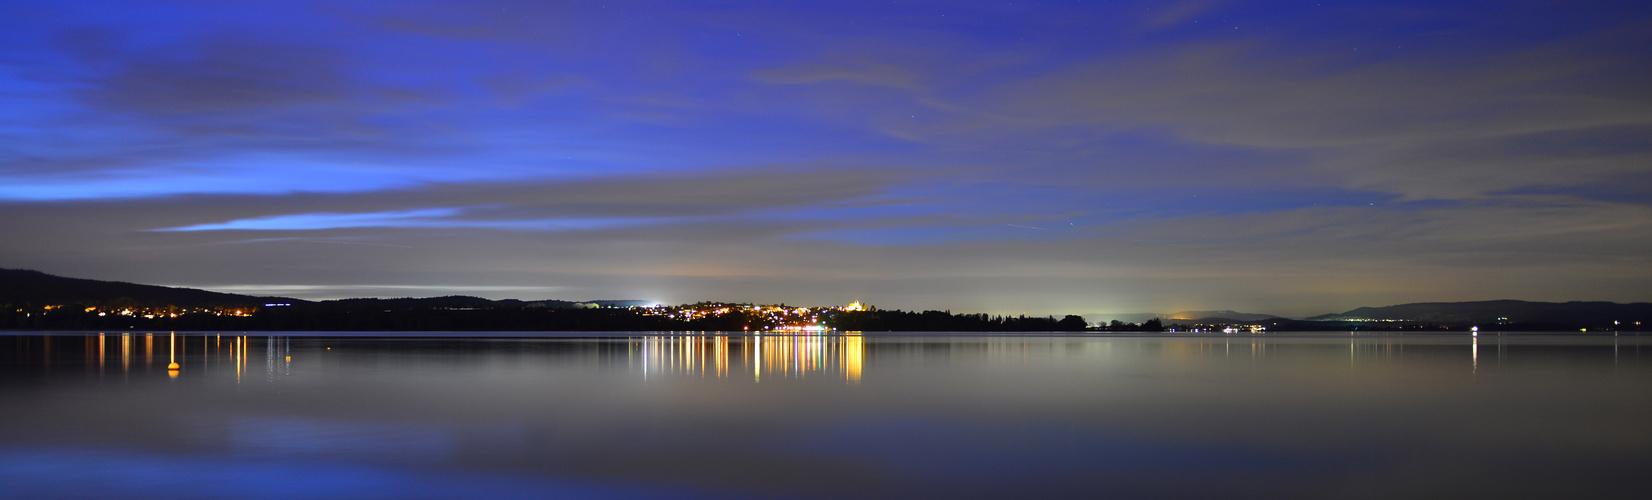 Sommernacht am Bodensee